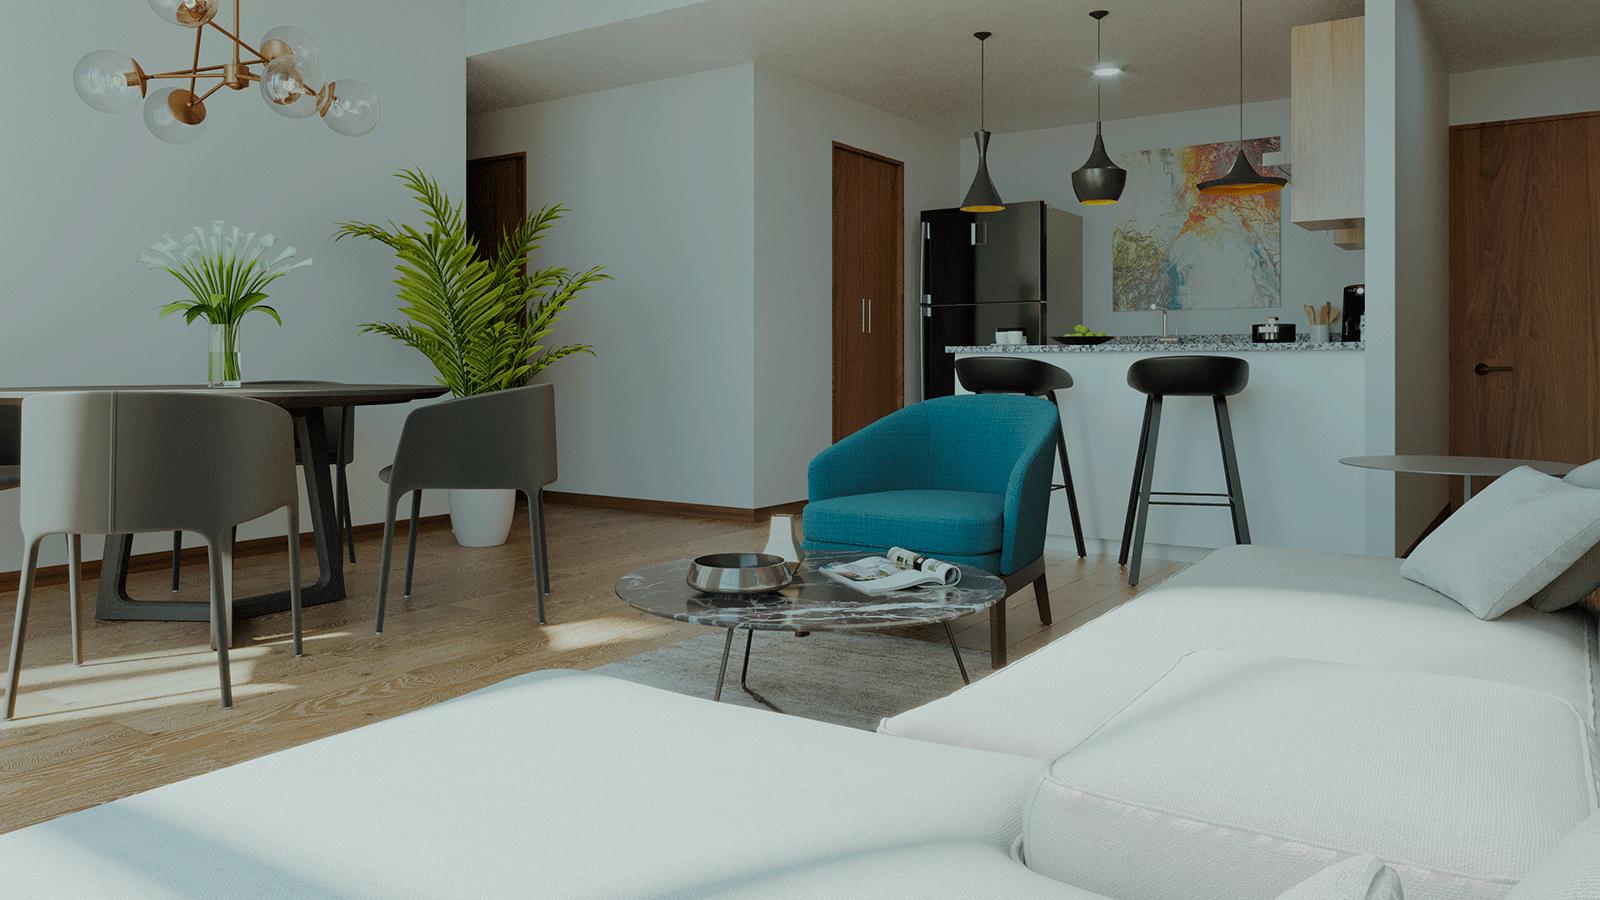 beneficios de vivir en un apartamento